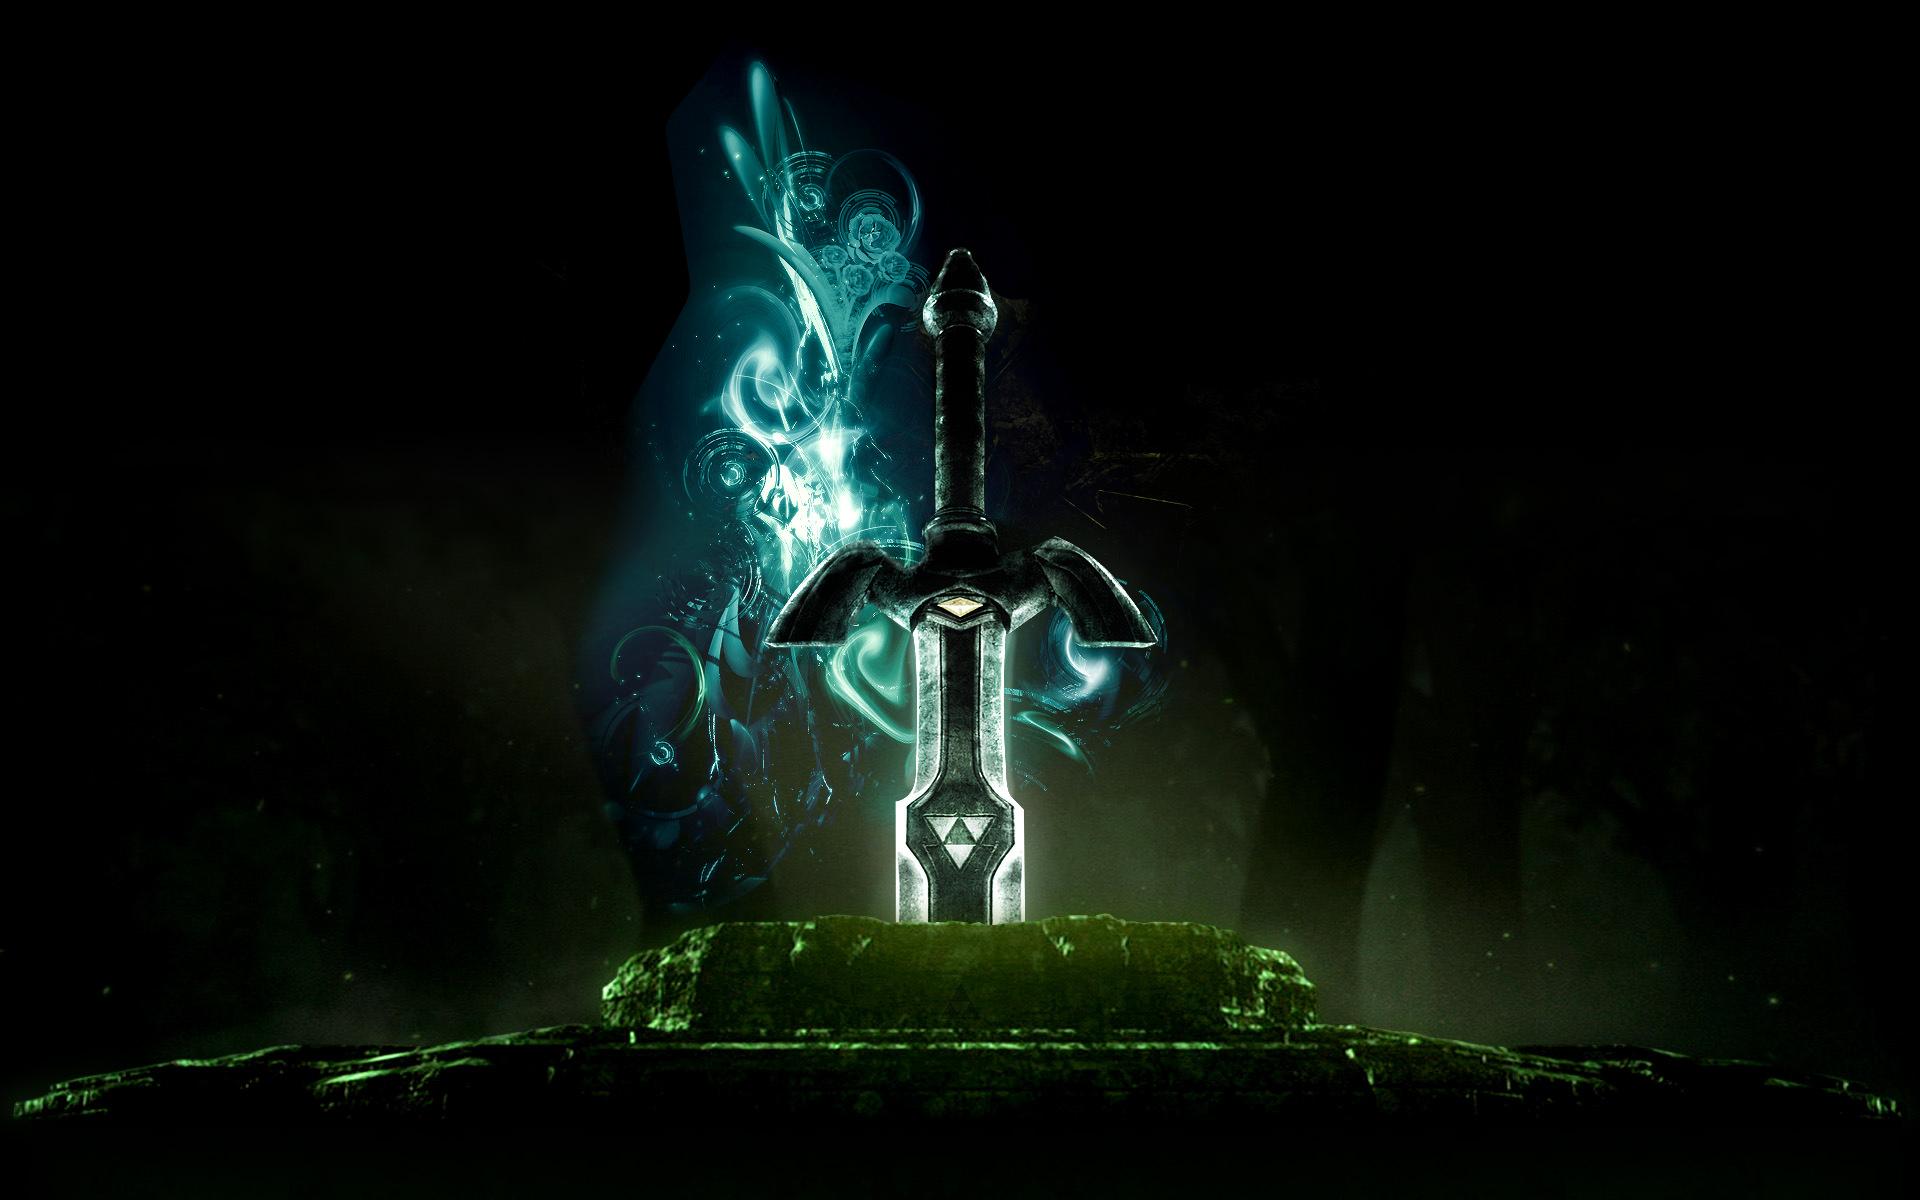 Zelda Res: 1920x1200 / Size:501kb. Views: 214709